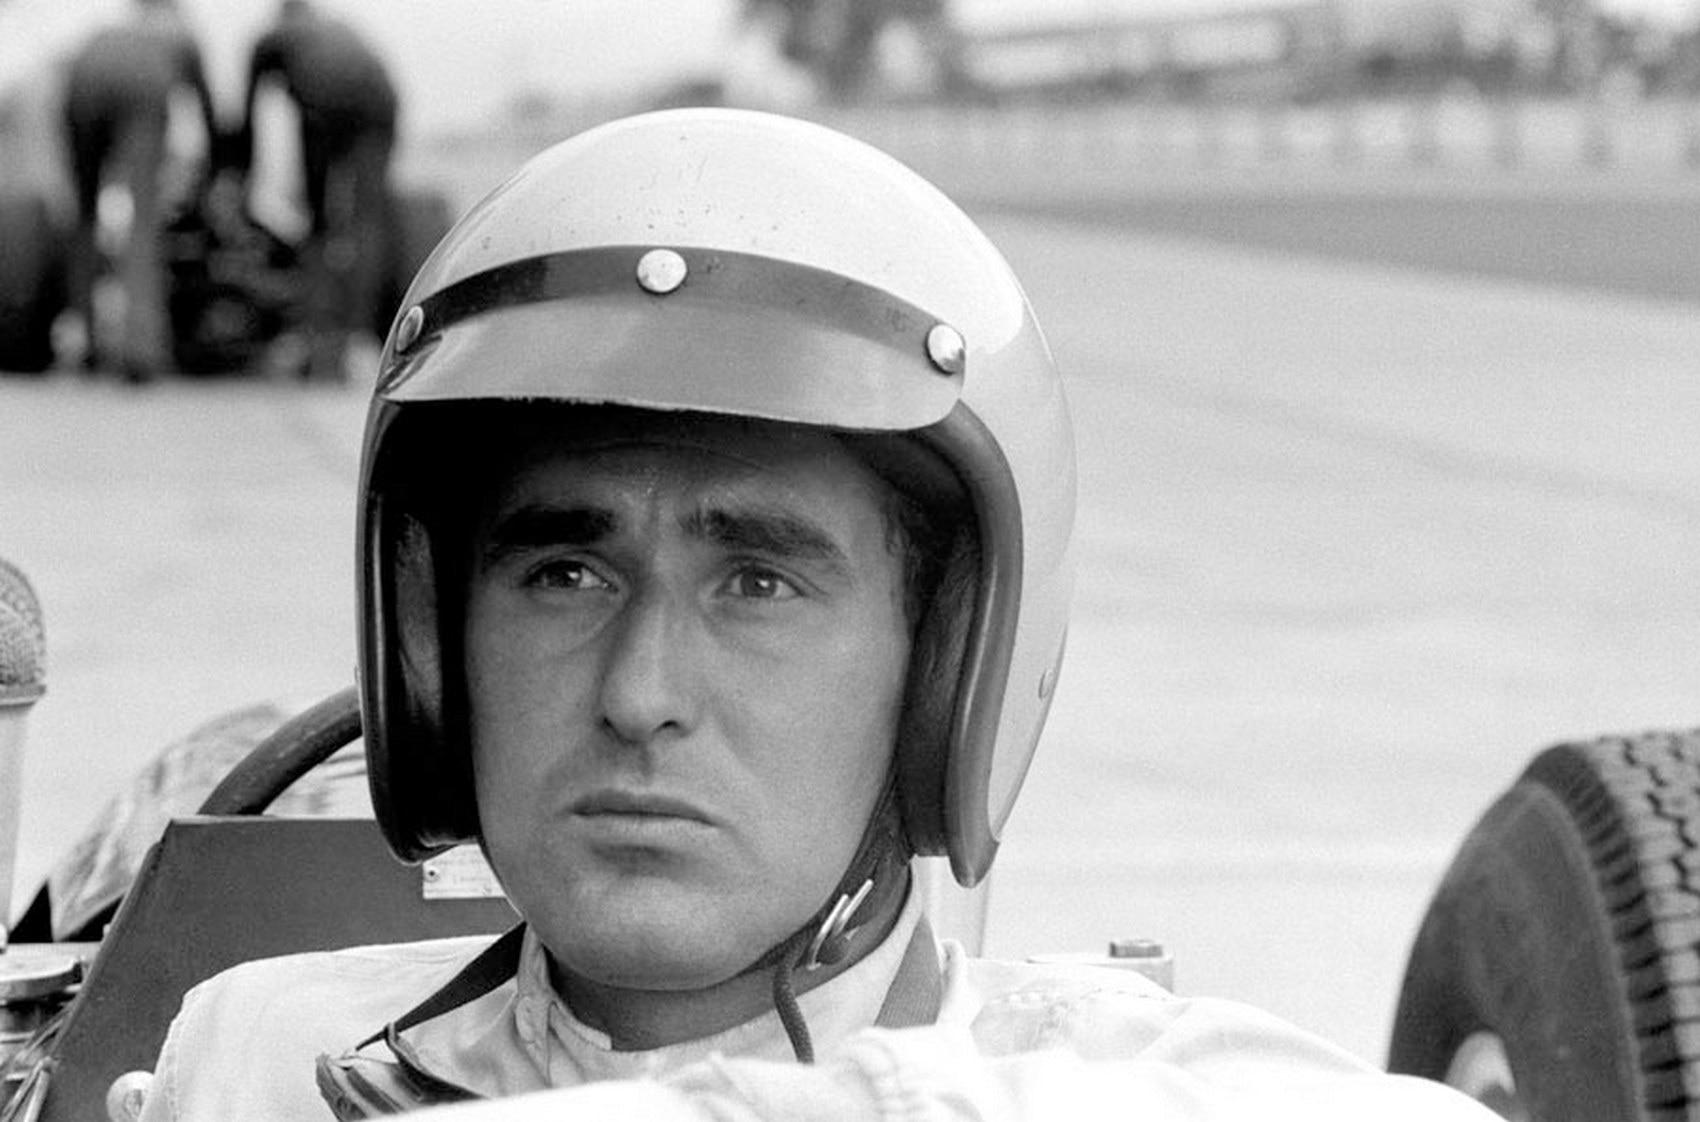 Lorenzo Bandini (ITA) Ferrari 158 finished sixth. German Grand Prix, Nurburgring, 1 August 1965.